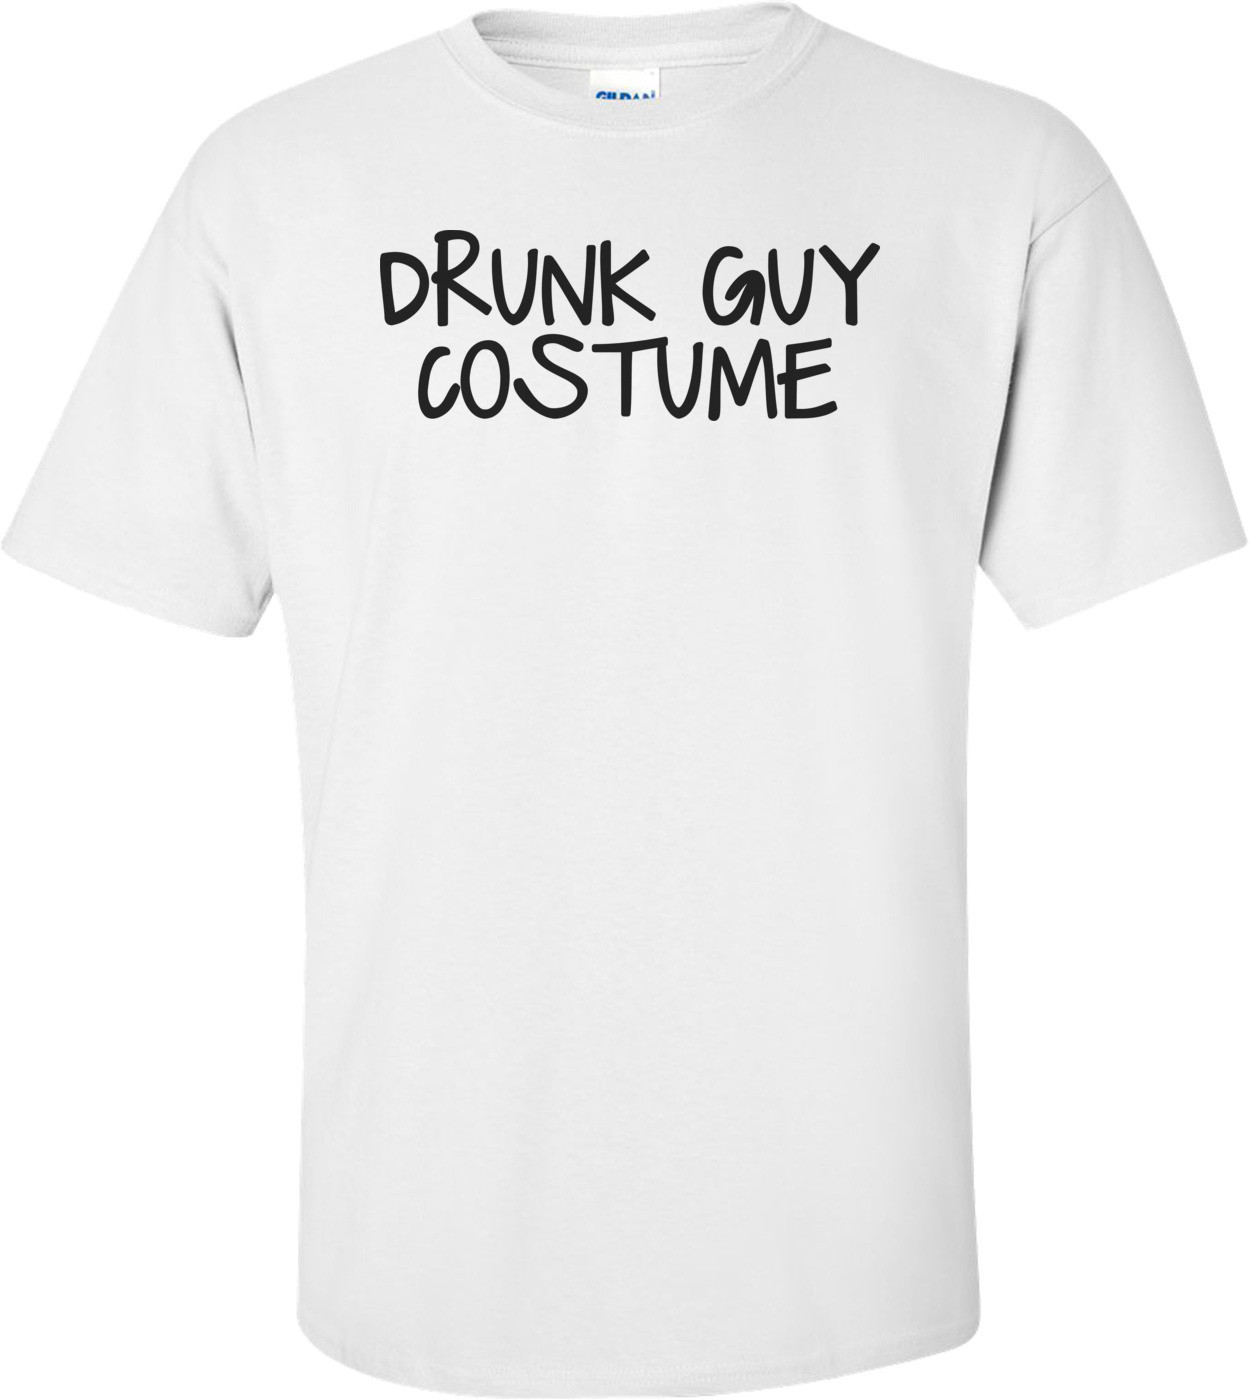 Drunk Guy Costume Halloween Shirt